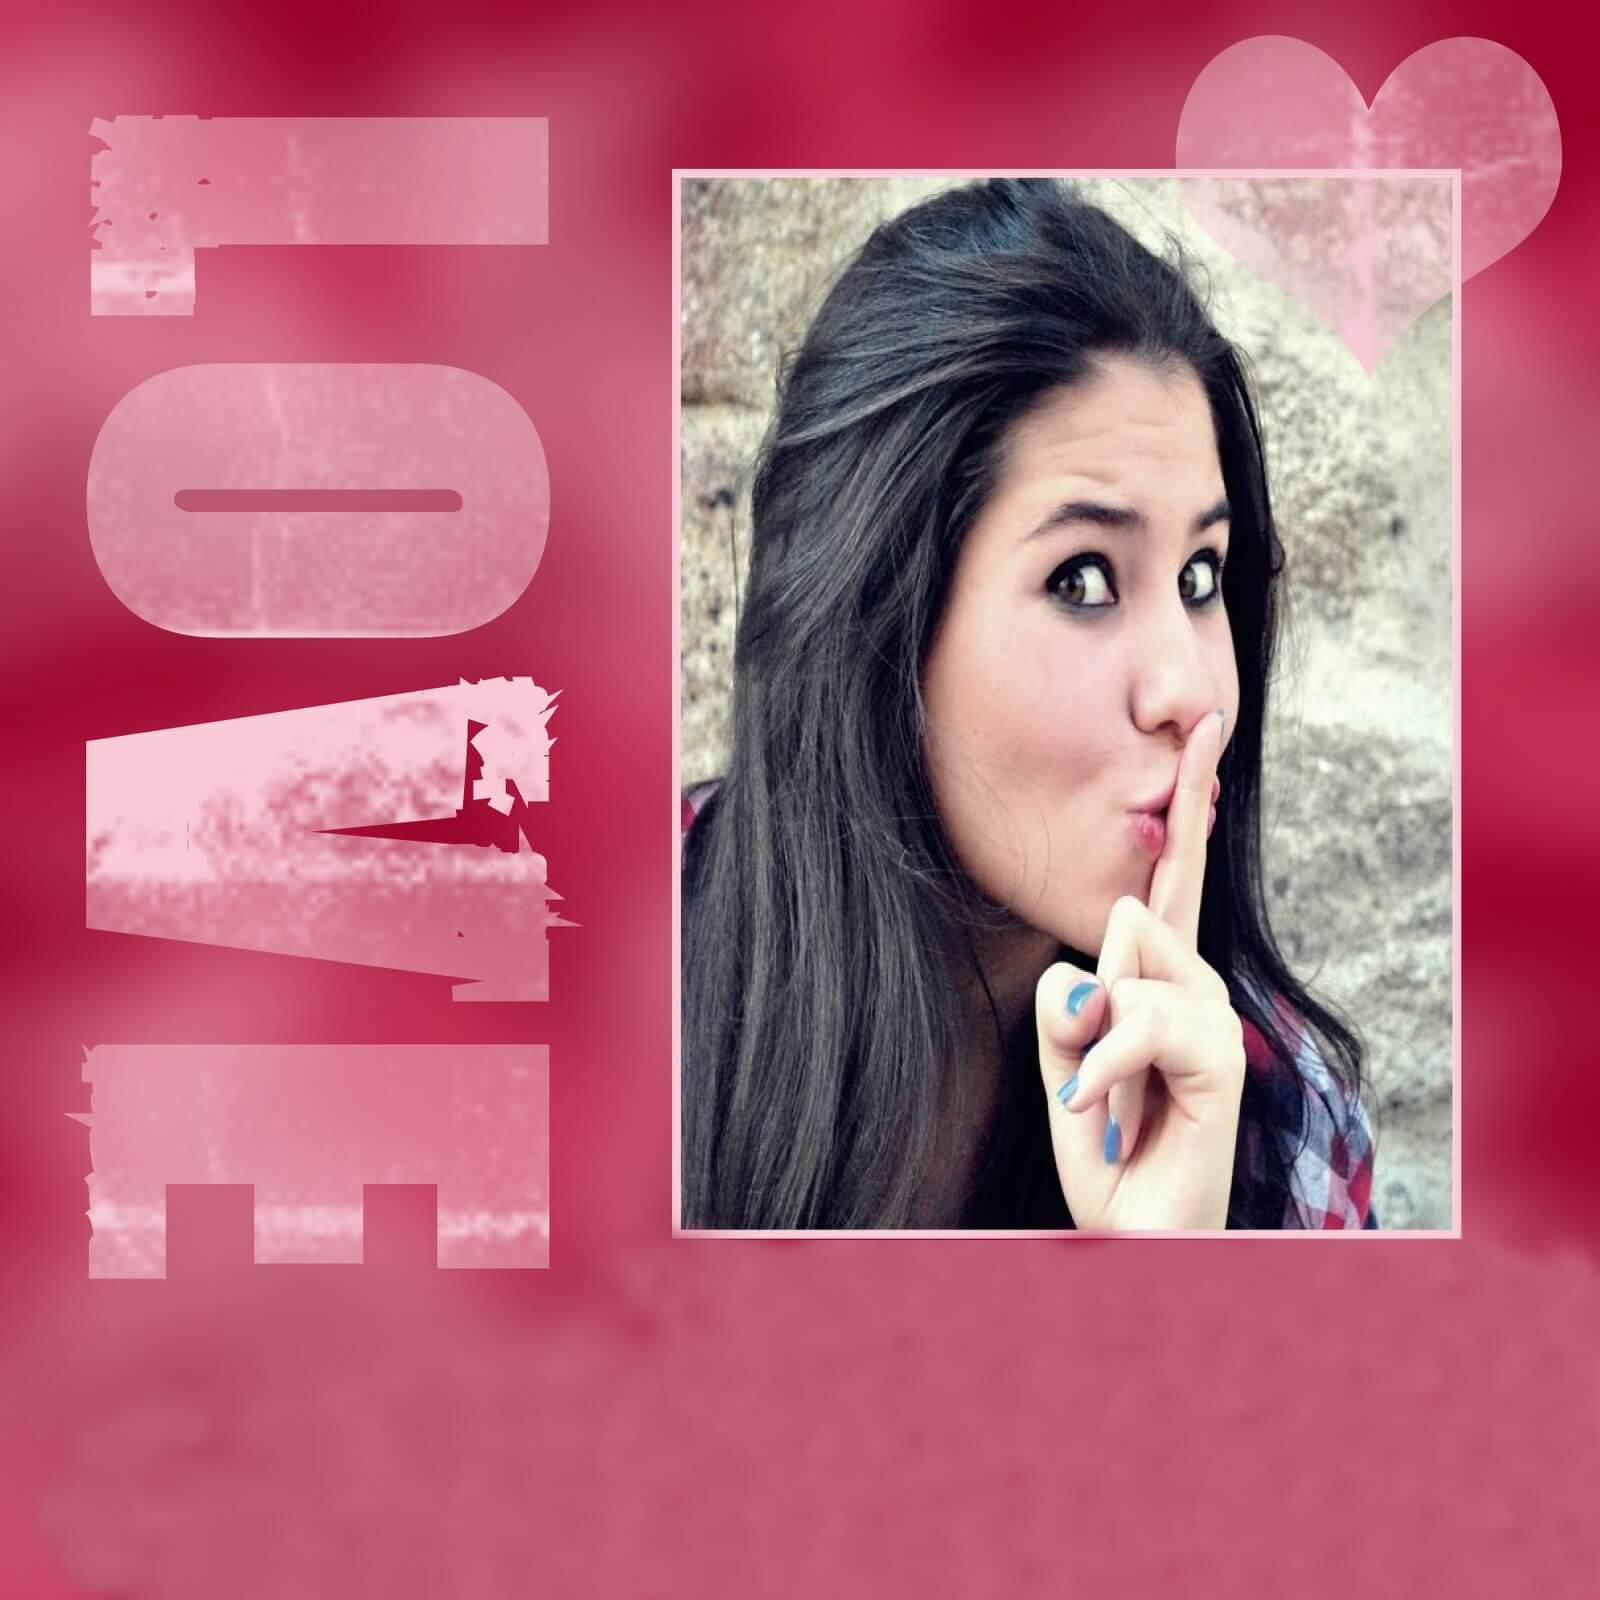 moldura-love-rosa